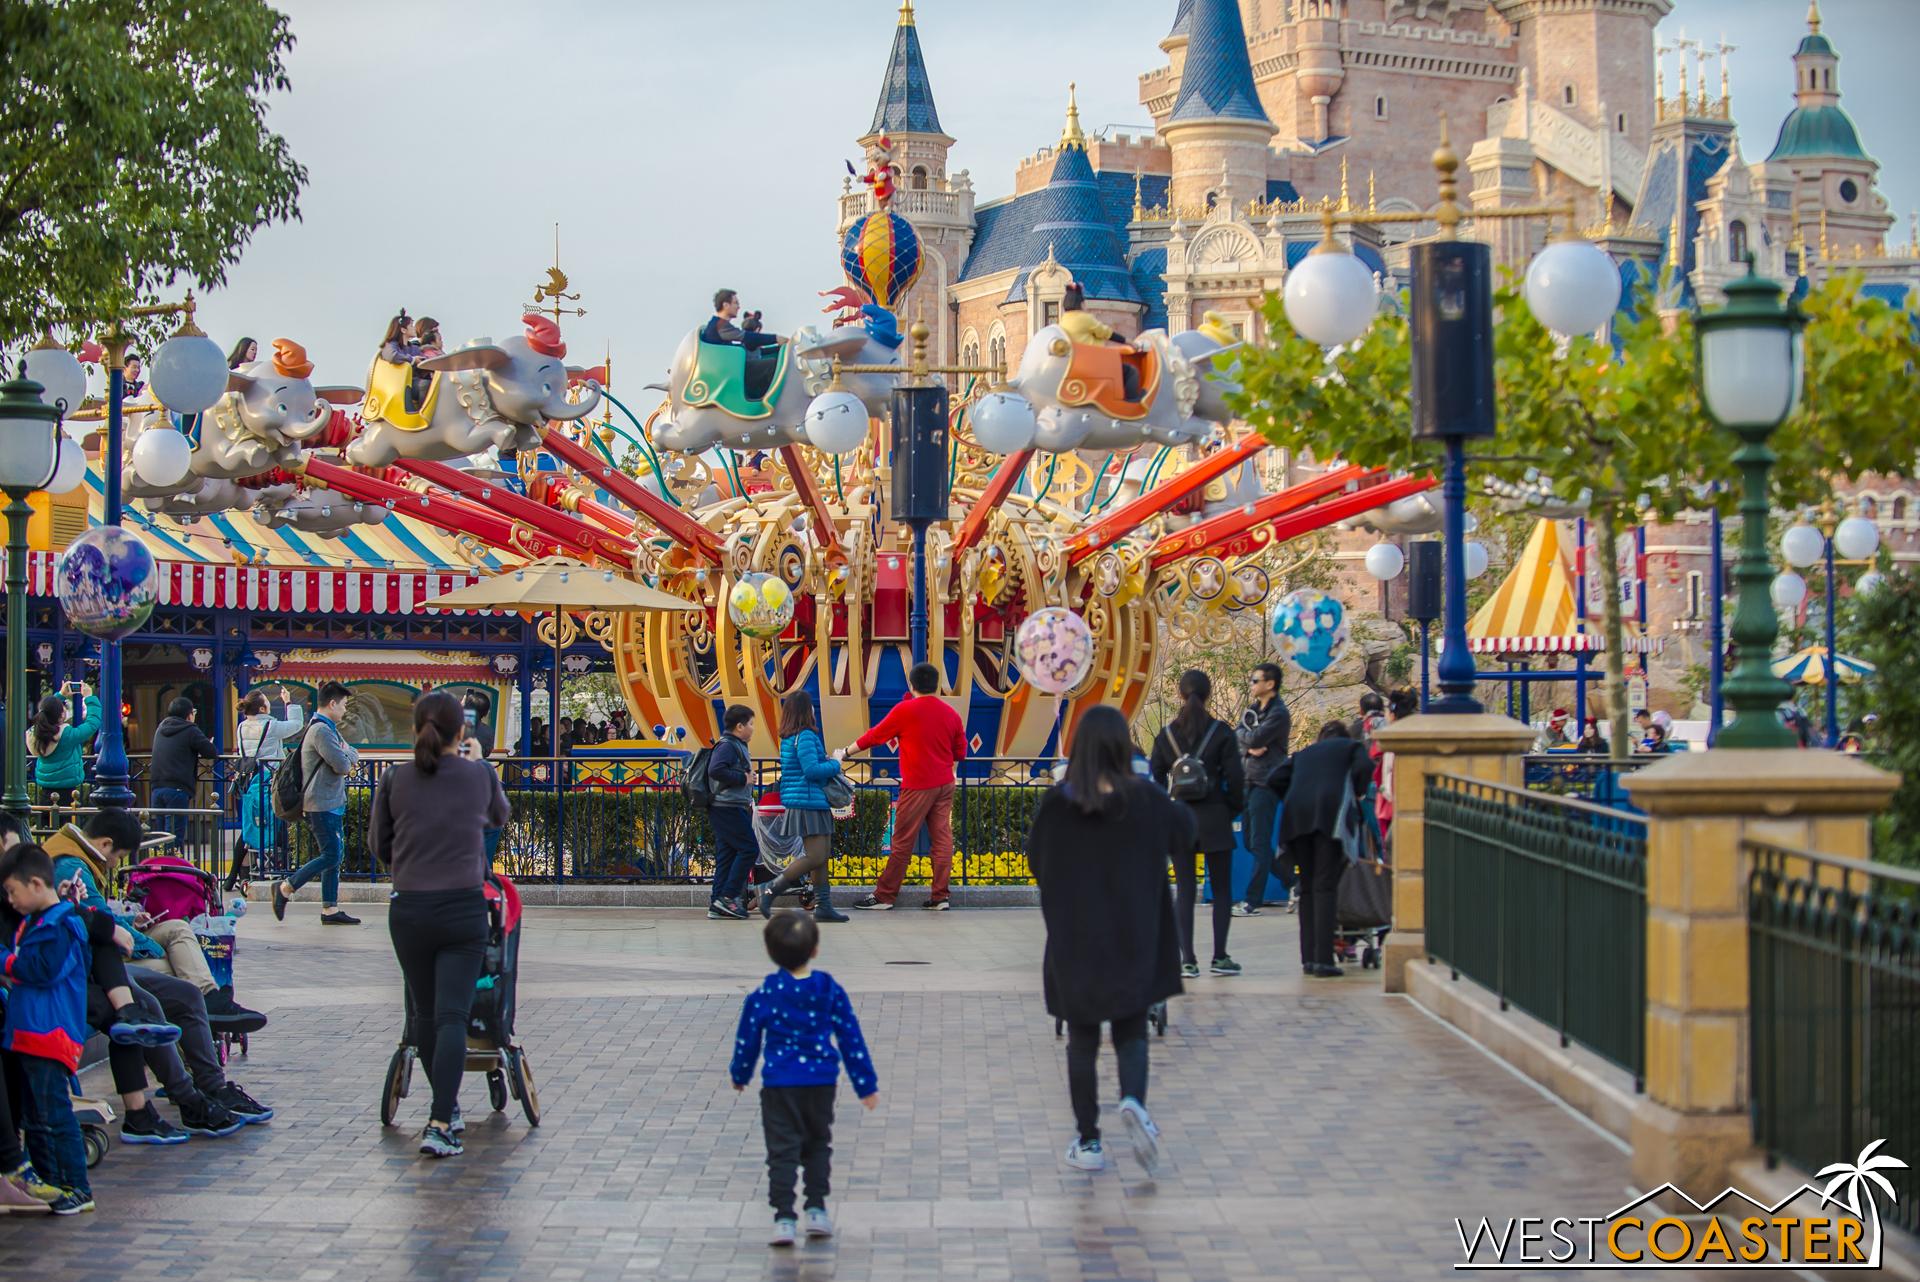 Popular favorite Dumbo the Flying Elephant is in the Gardens of Imagination at Shanghai Disneyland.